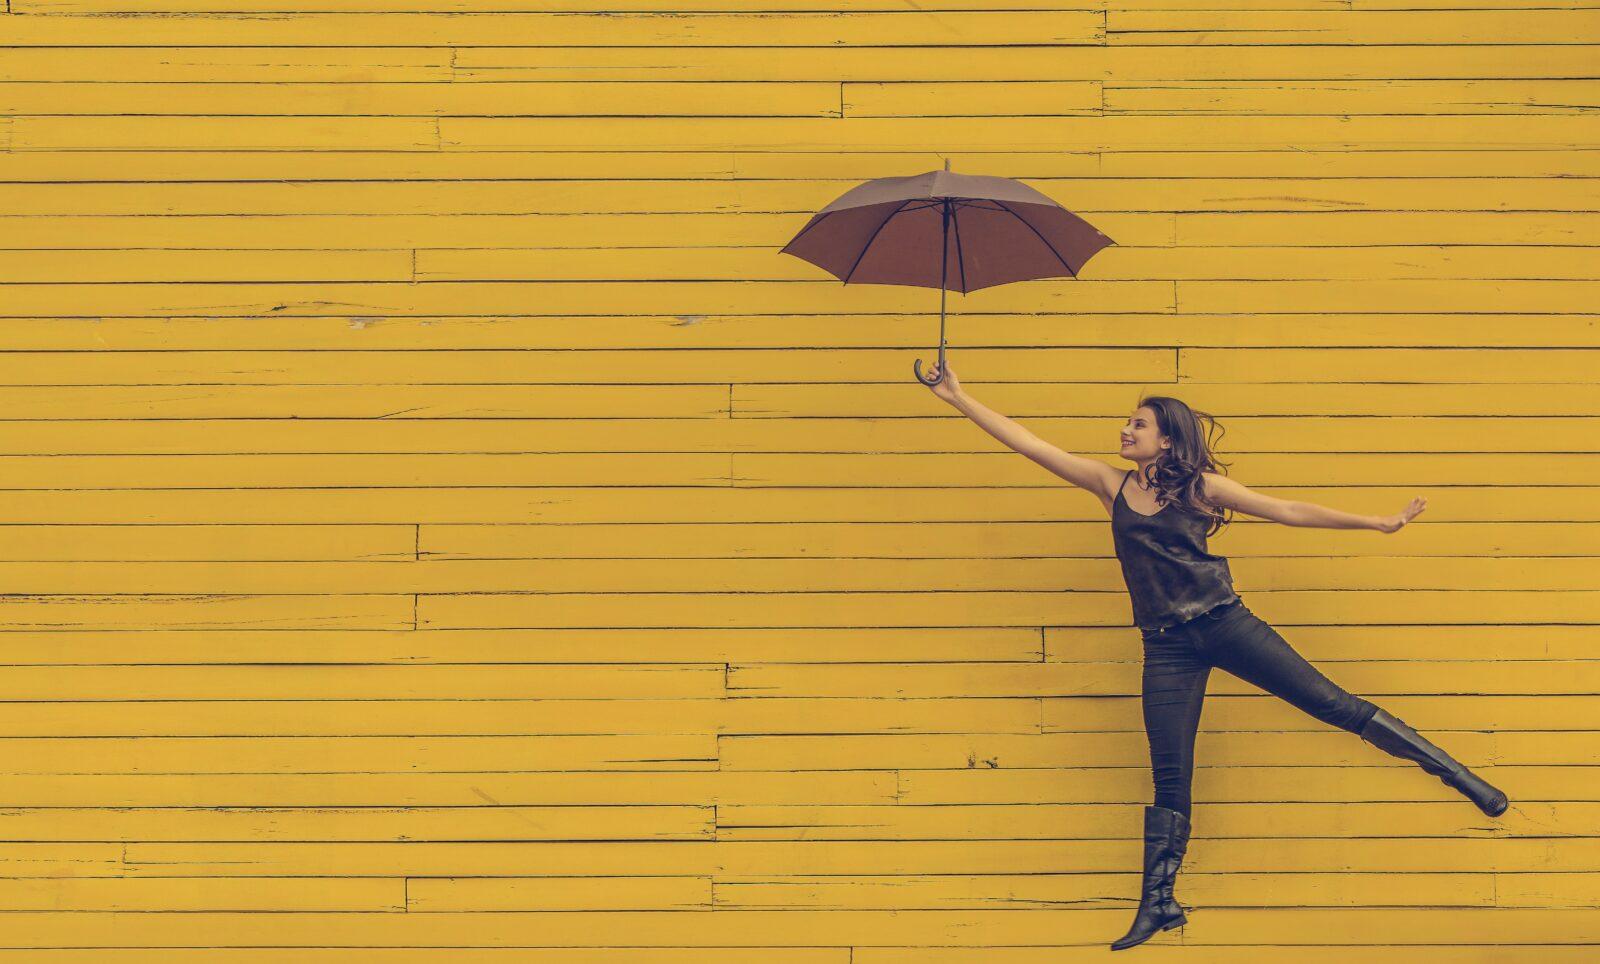 Someone holding an umbrella